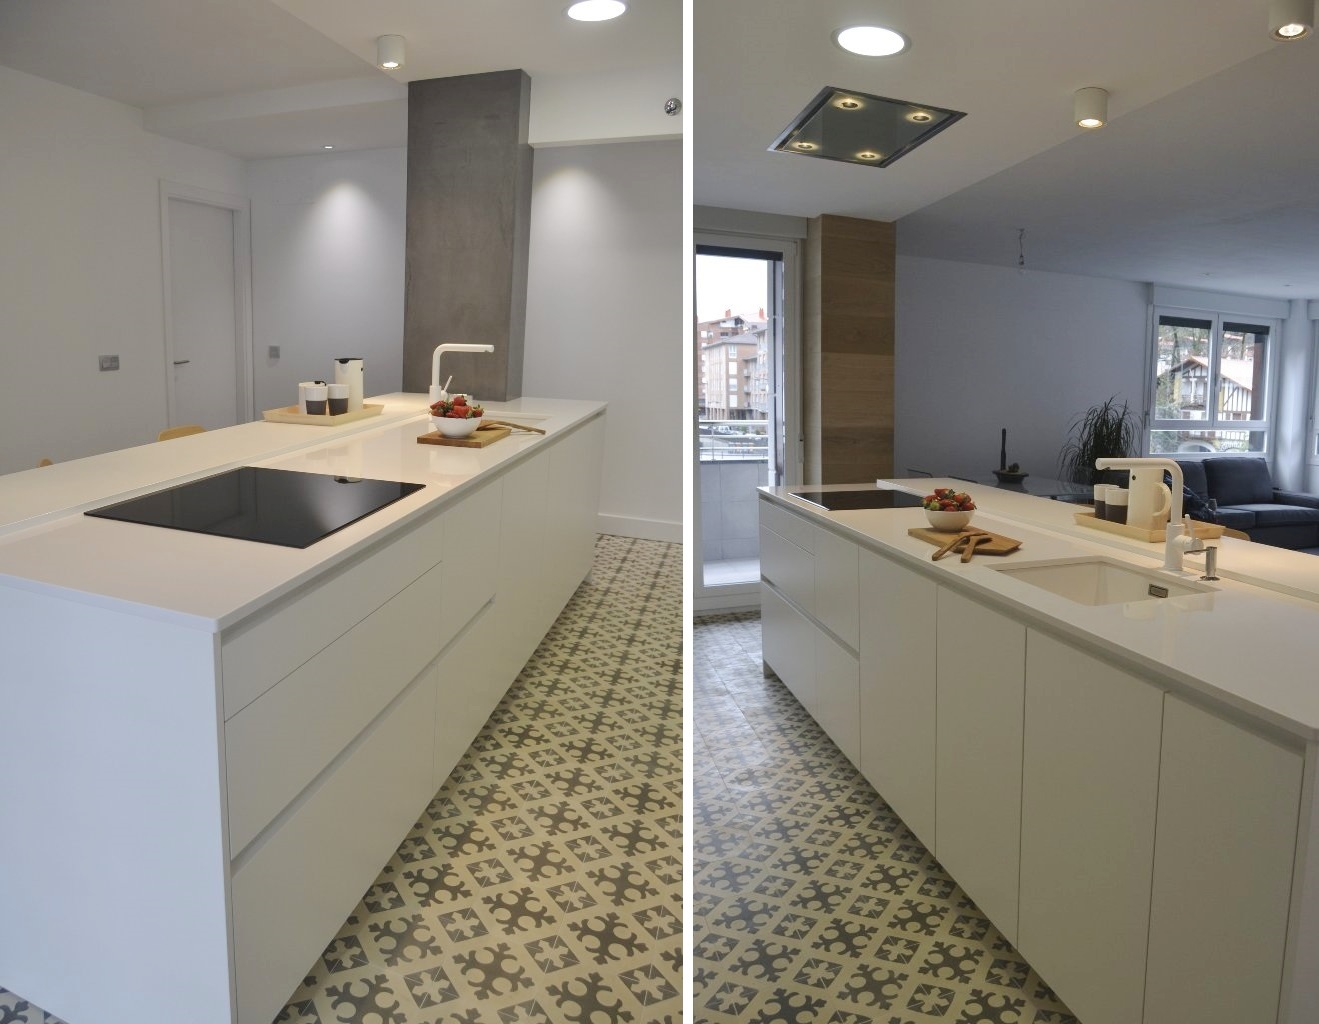 Dos modelos para una cocina en perfecta armon a cocinas - Cocinas blancas de diseno ...